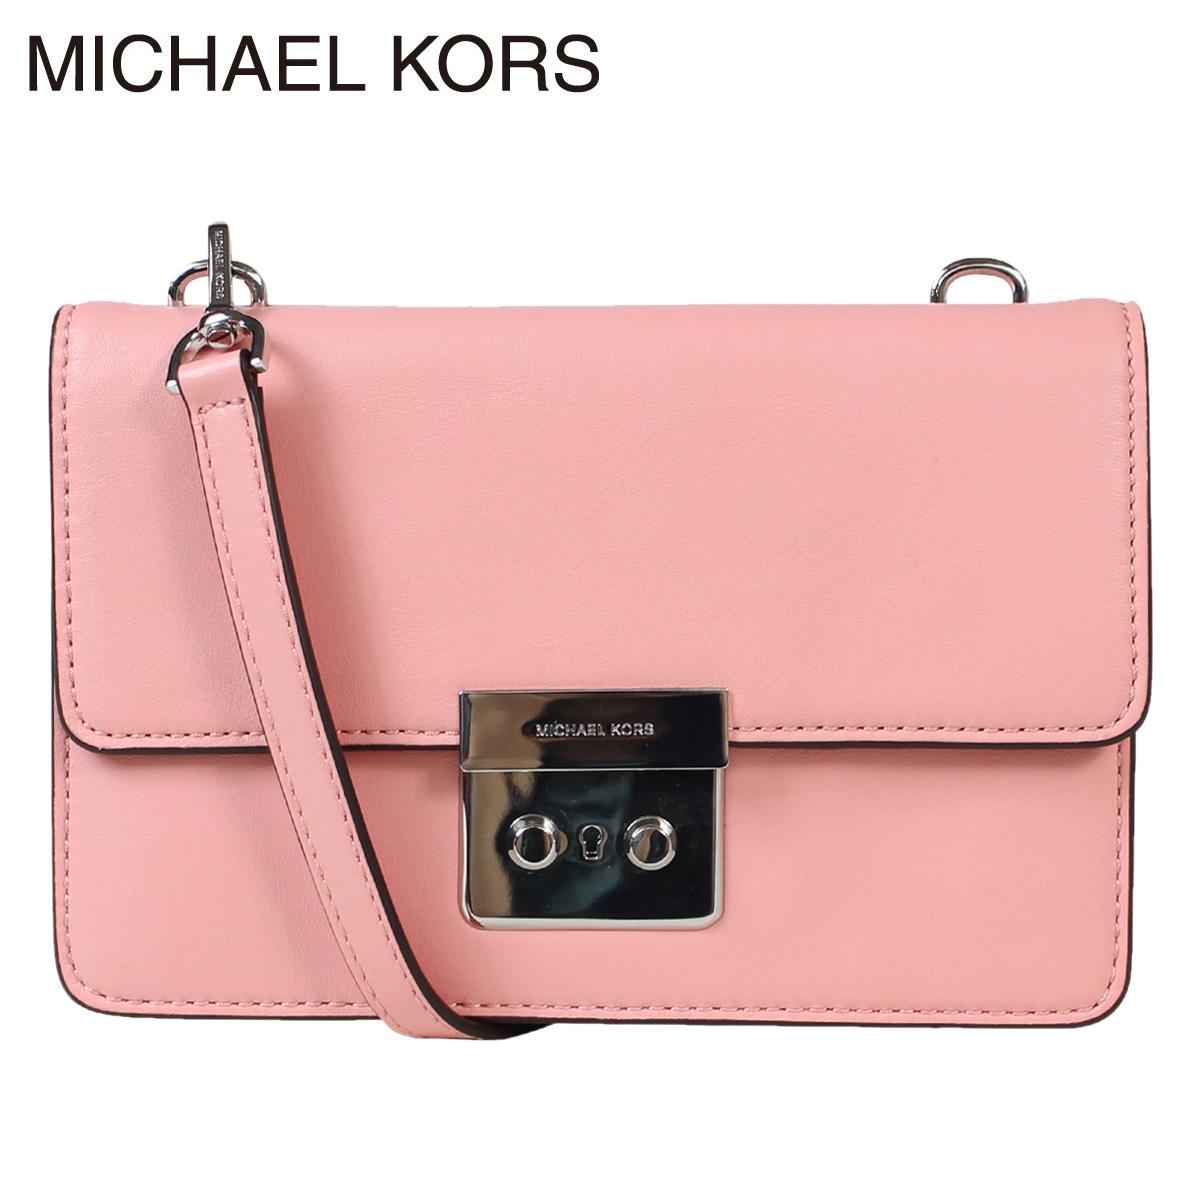 ALLSPORTS | Rakuten Global Market: MICHAEL KORS Michael Kors bag ...